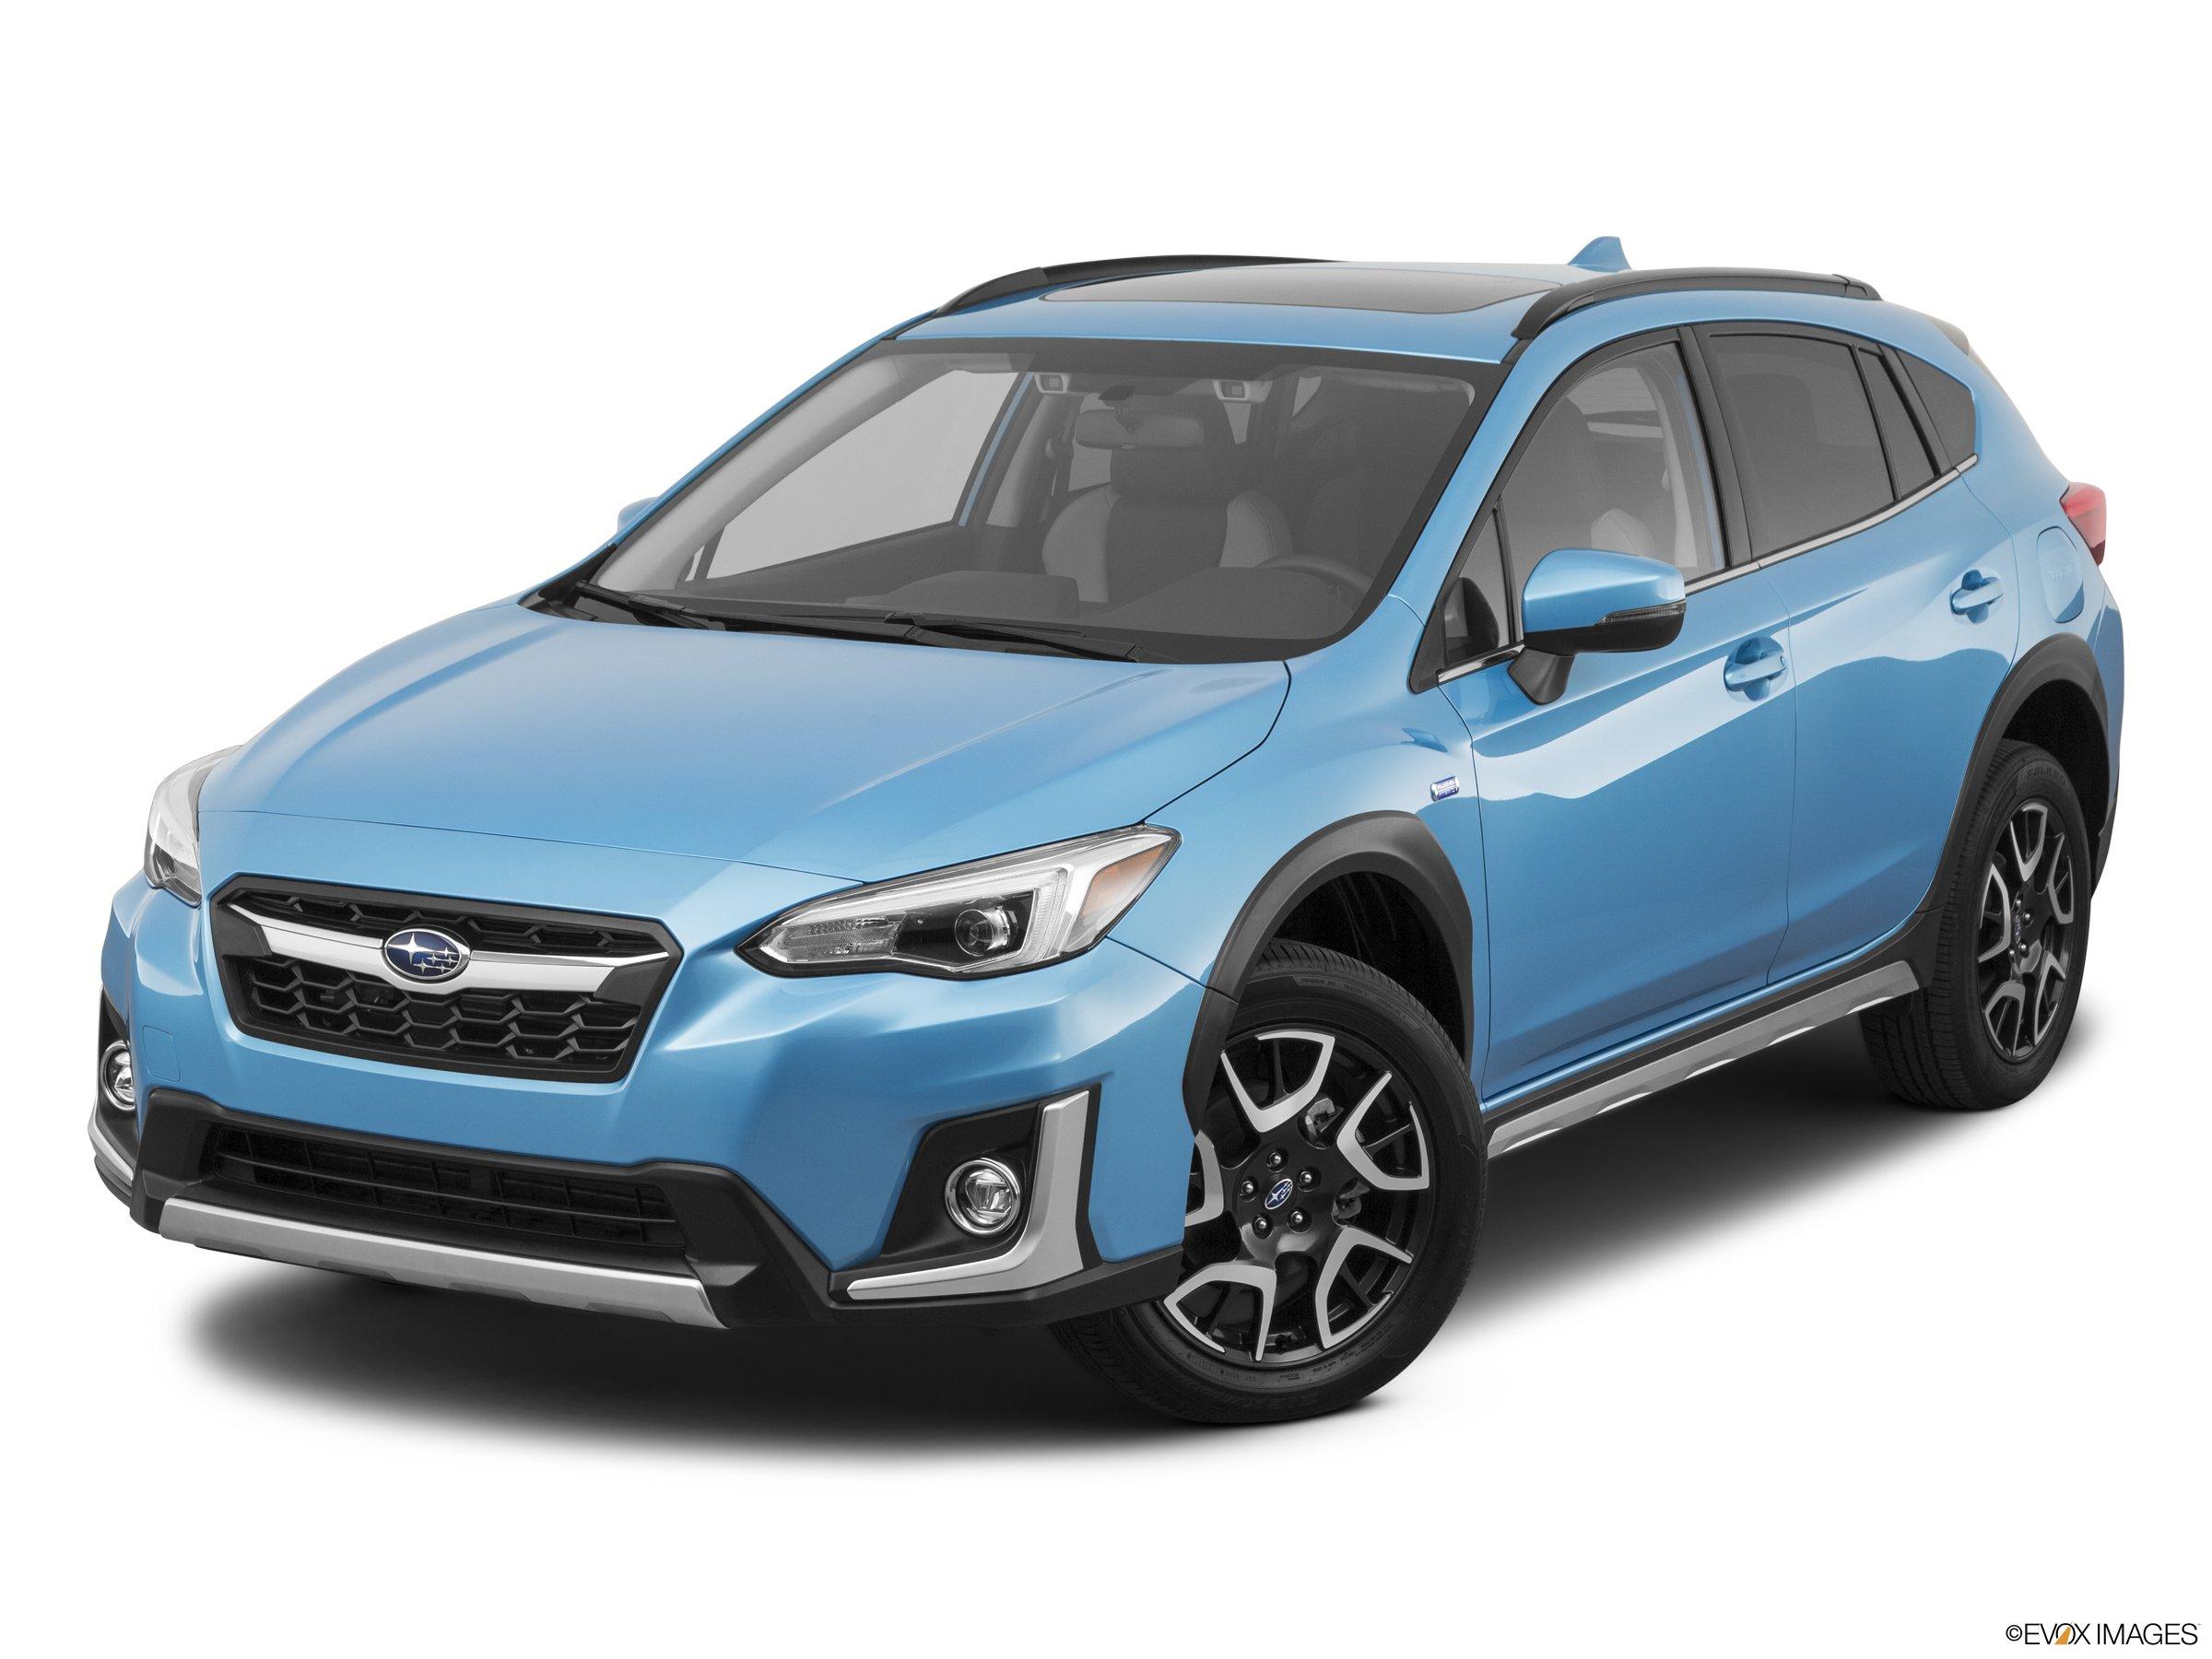 2020 Subaru Crosstrek Hybrid 2.0i AWD CUV